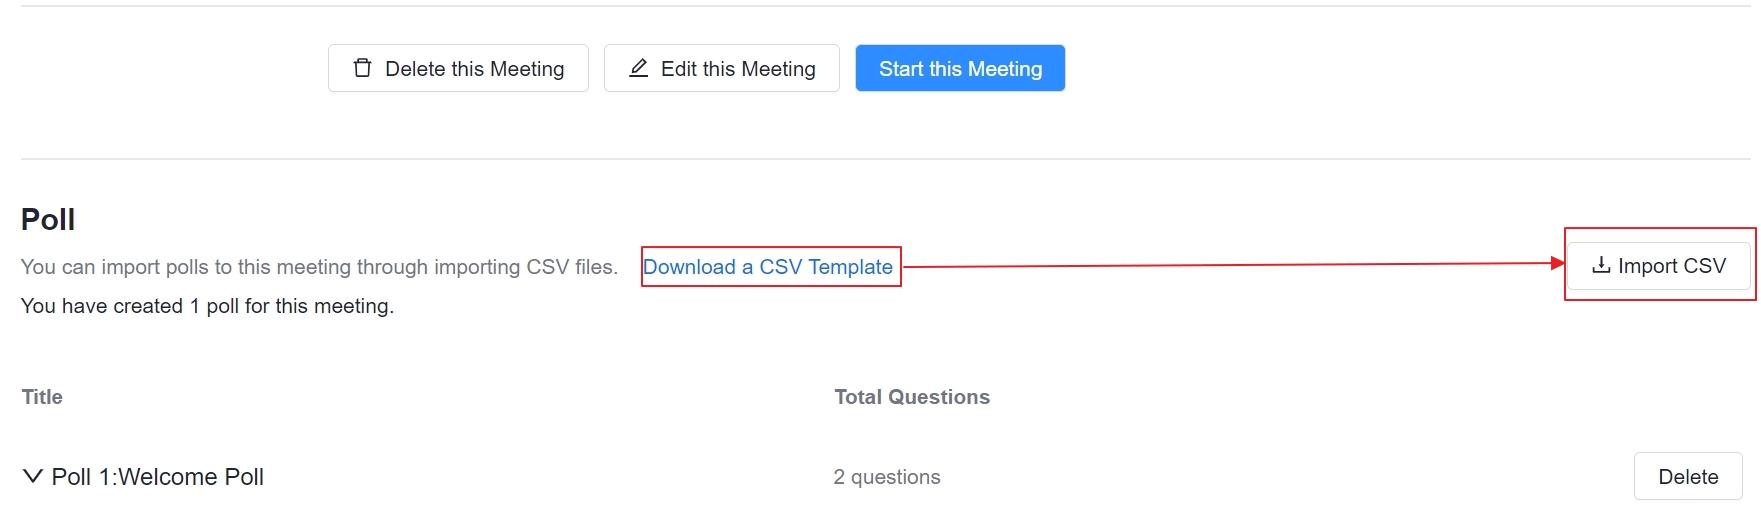 Upload a csv file